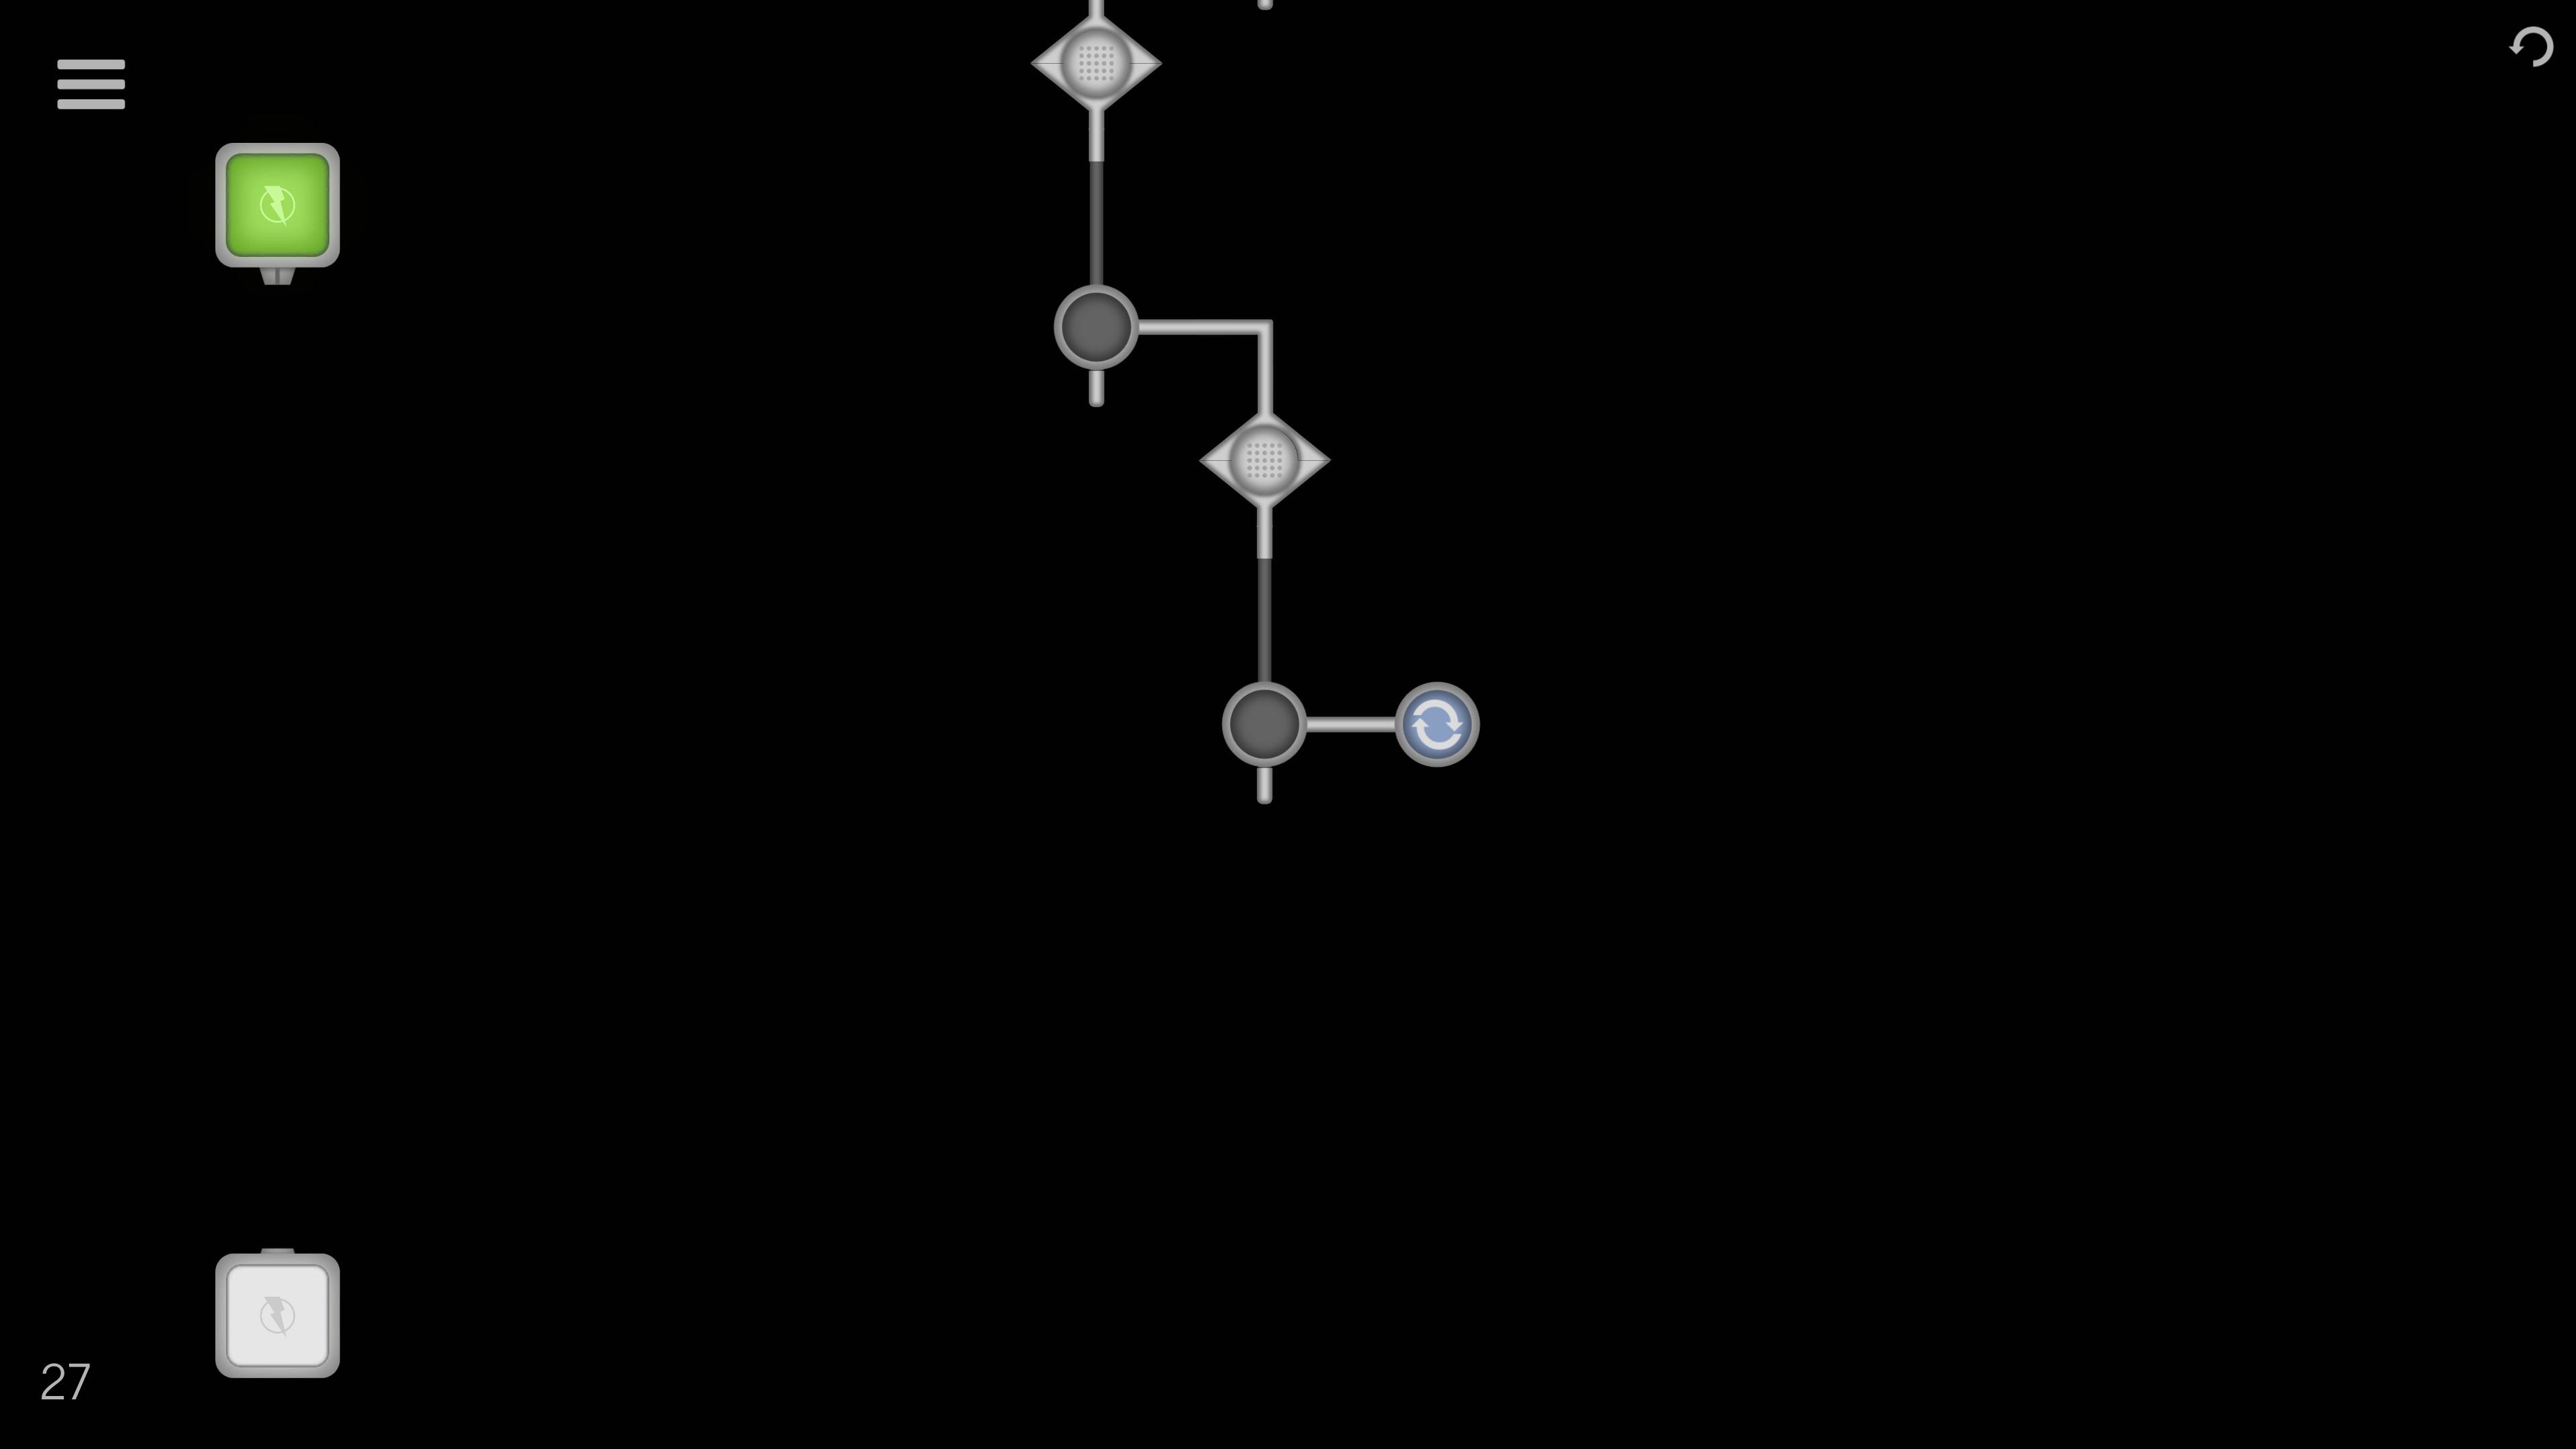 Flex hooks game screenshot.